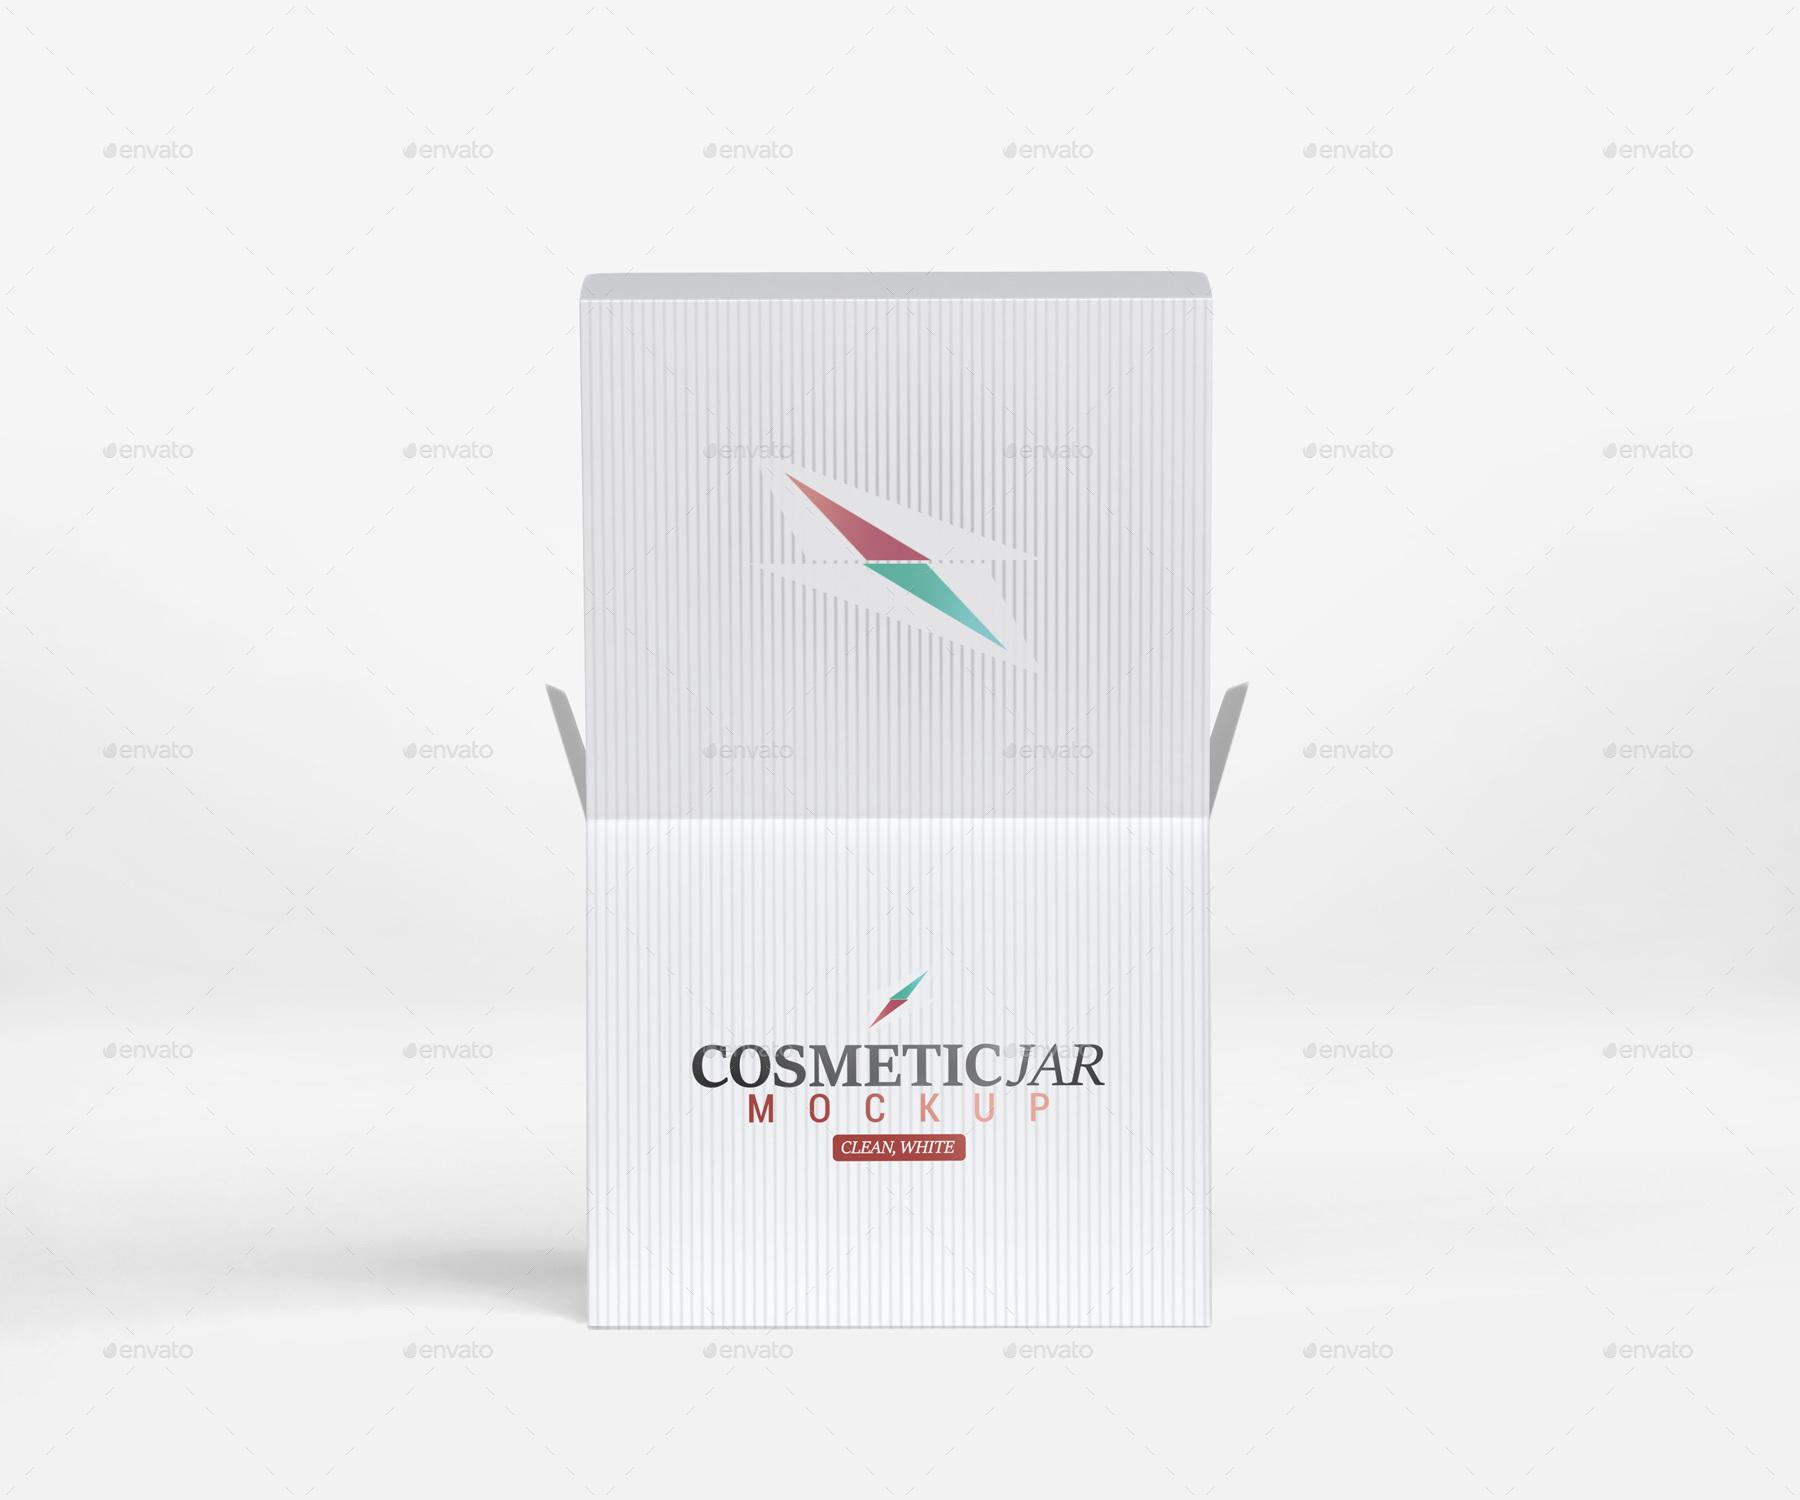 Sports Cap Logo Mockup Isolated: Cosmetic Jar & Box Mockup By Pixelica21